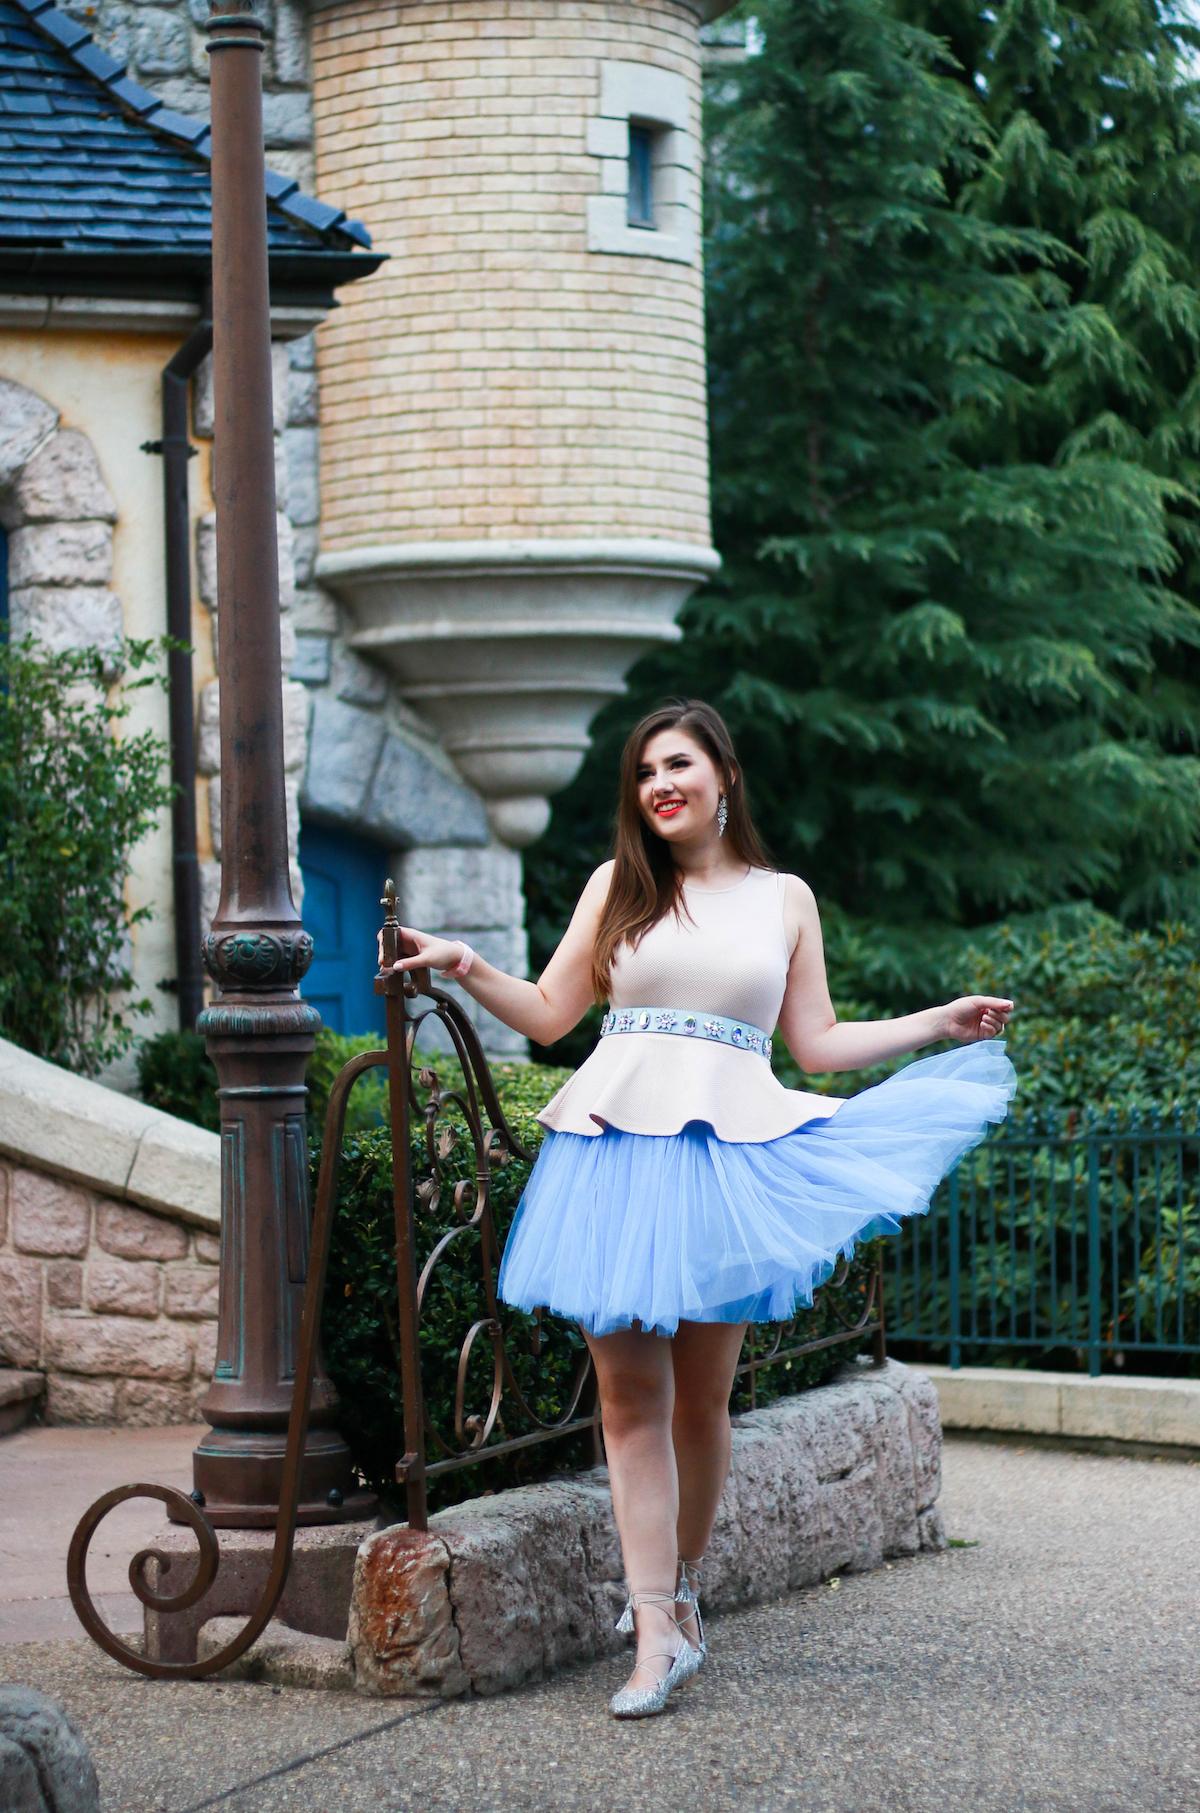 sara-bow-disneyland-paris-outfit